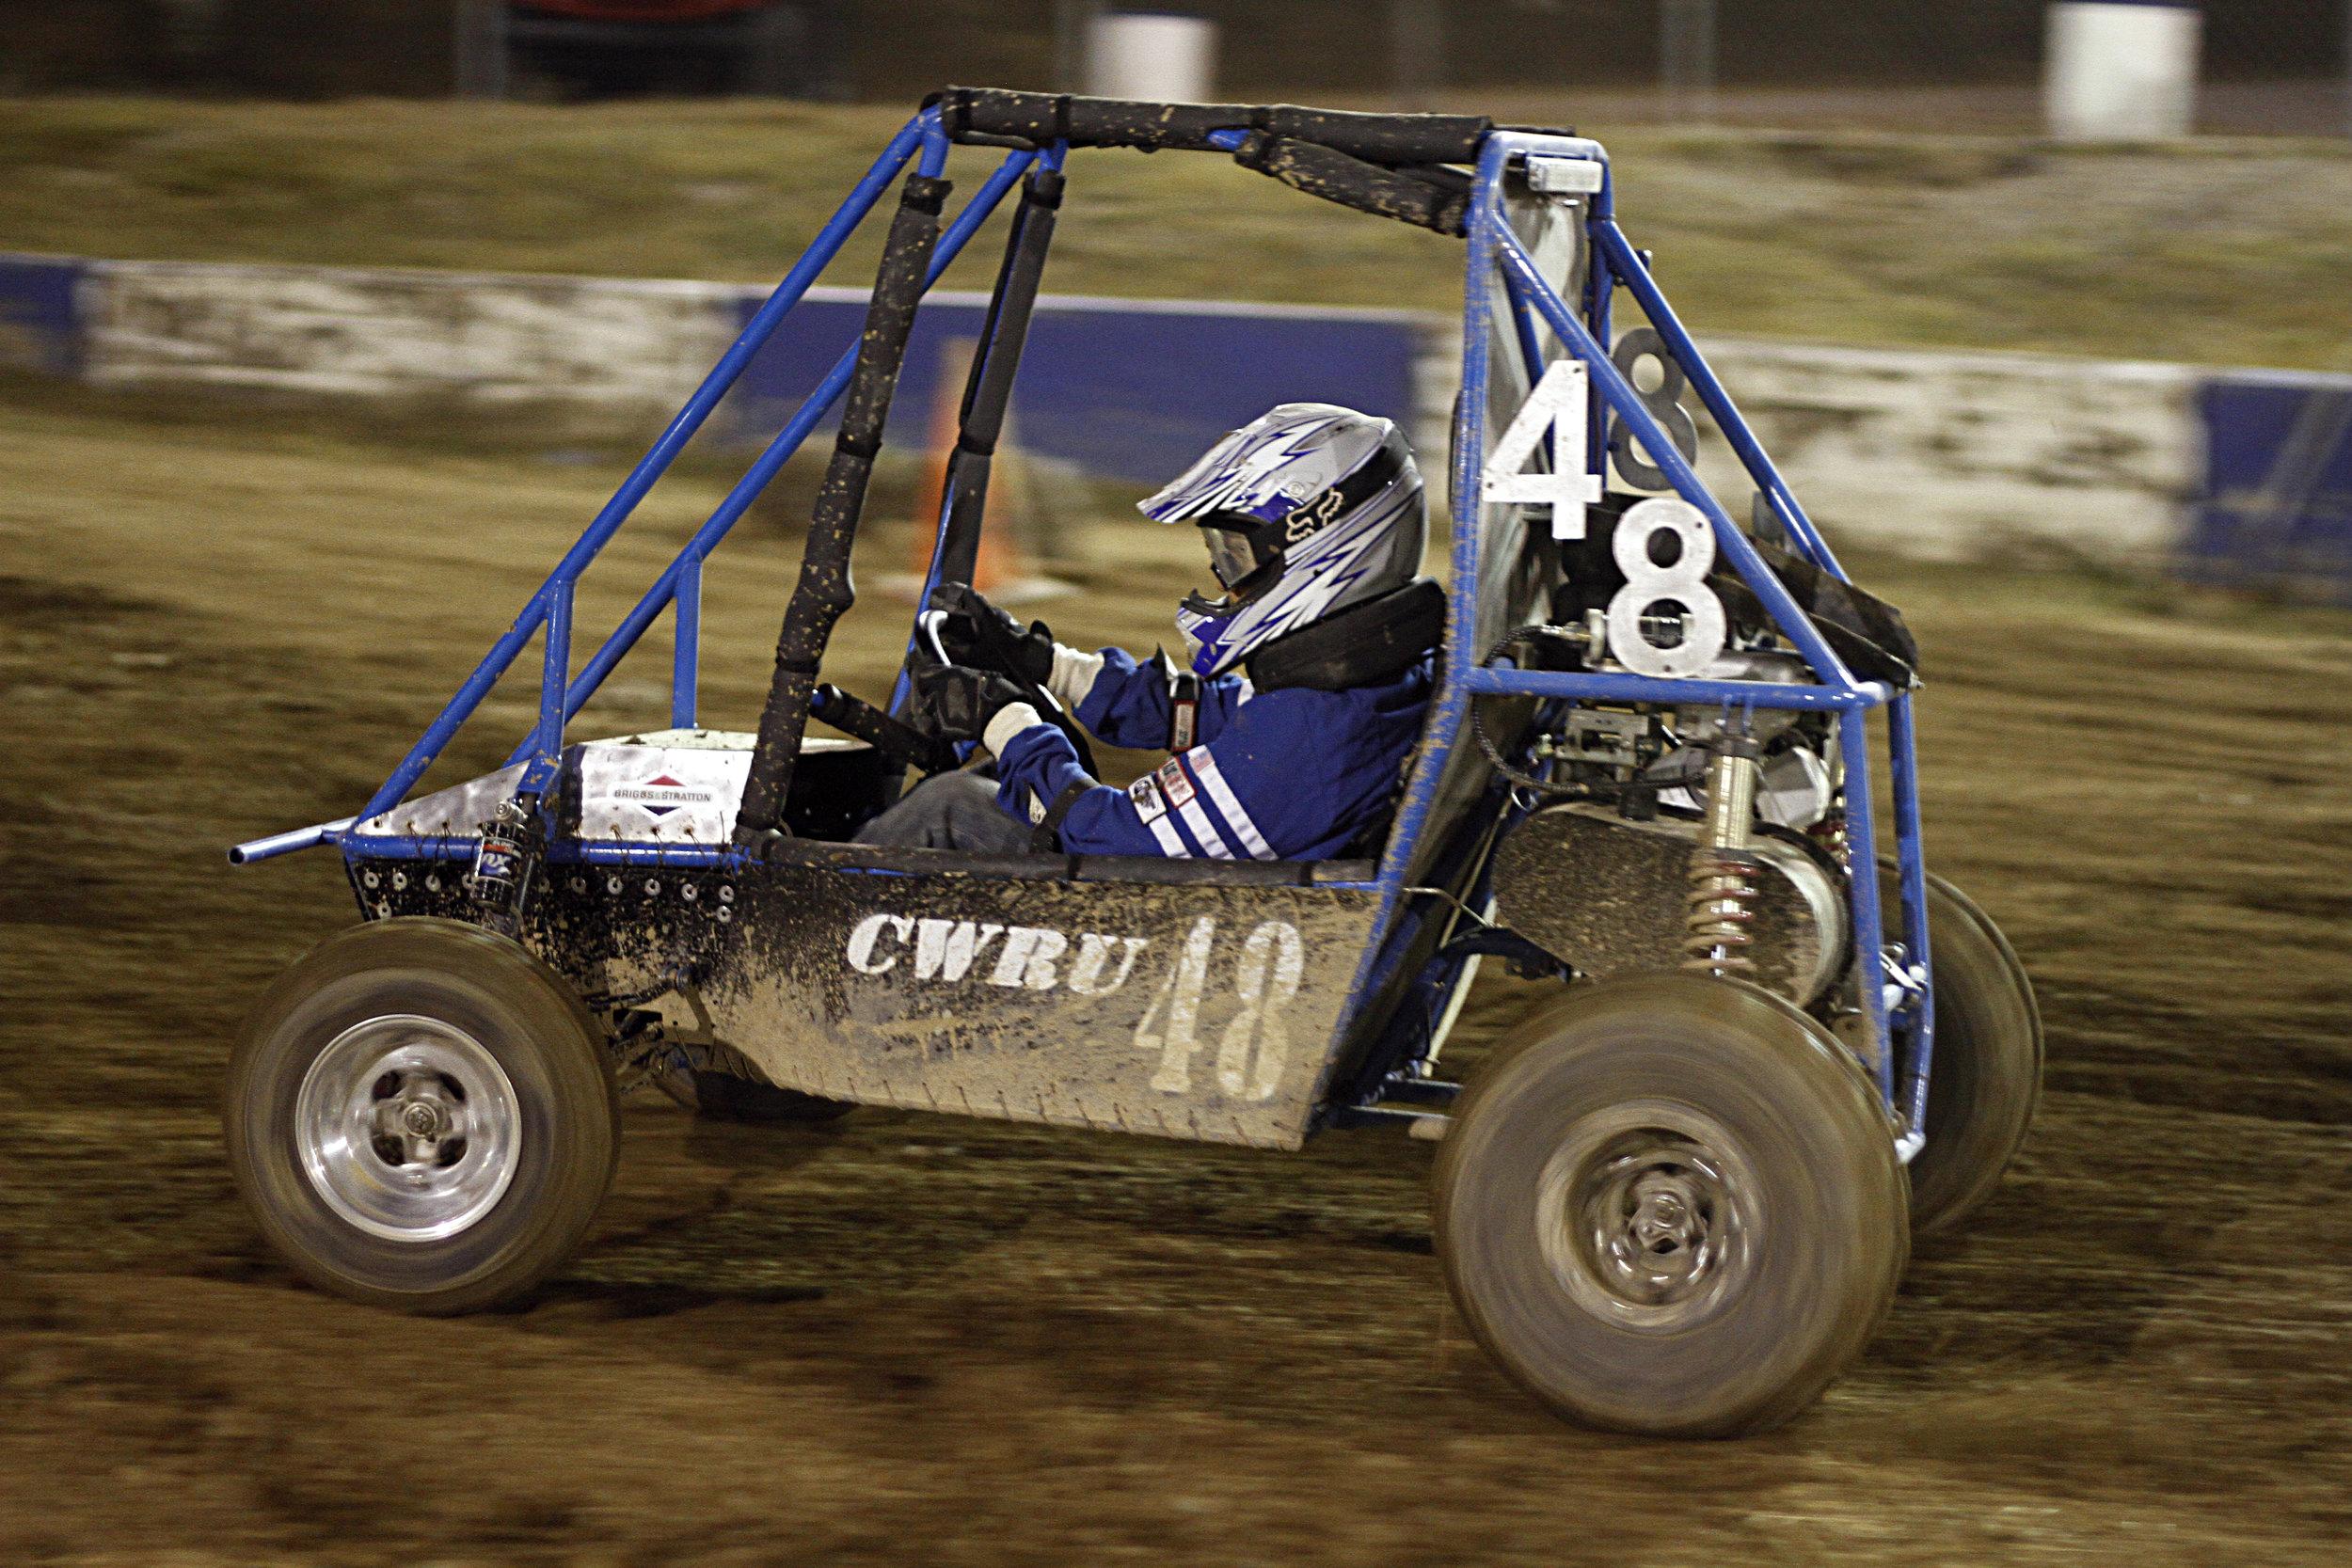 2nd Place: Case Western Reserve University - Car# 48 | 58 Laps